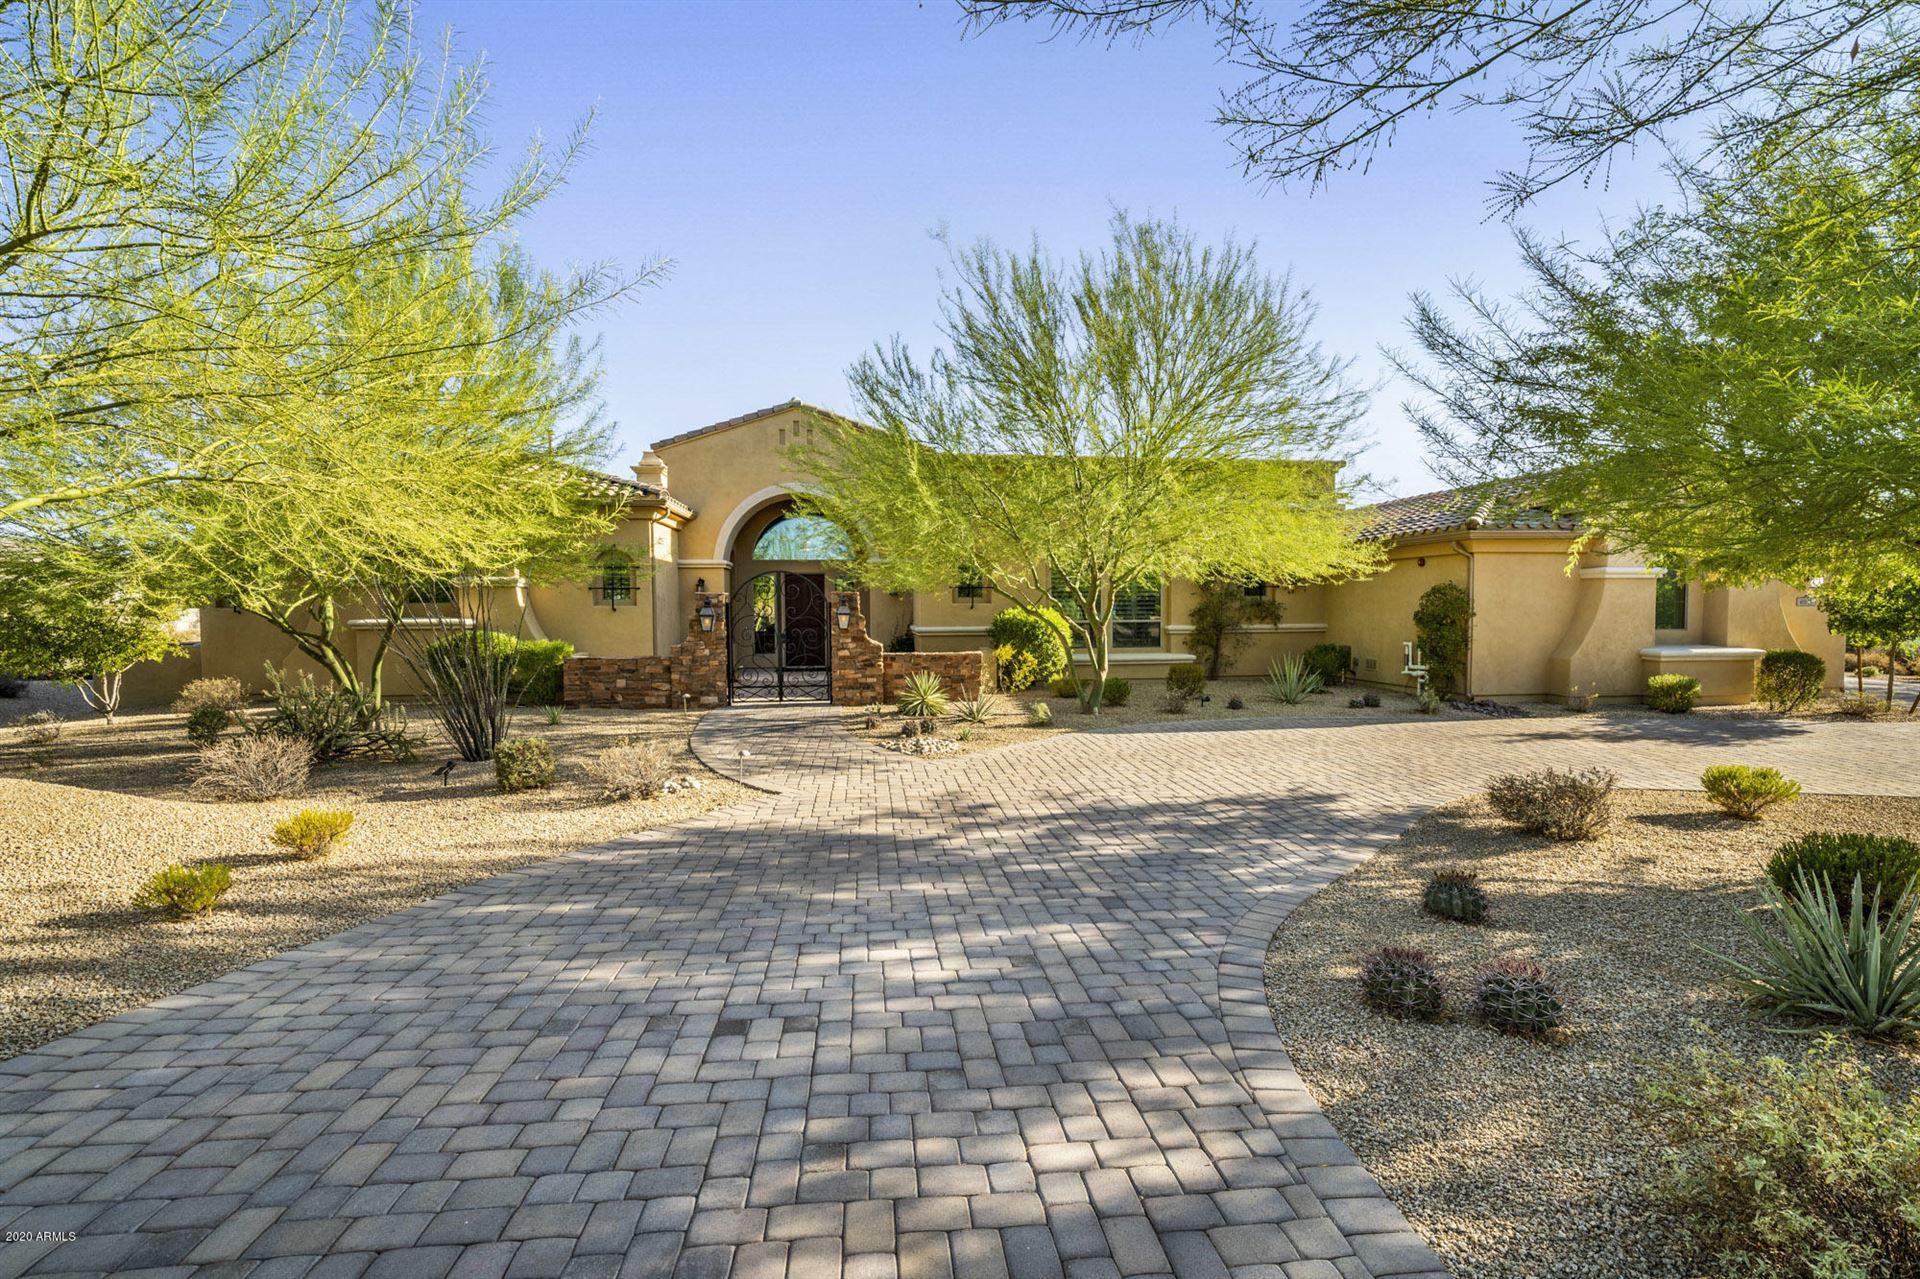 6945 E BLUE SKY Drive, Scottsdale, AZ 85266 - MLS#: 6129854